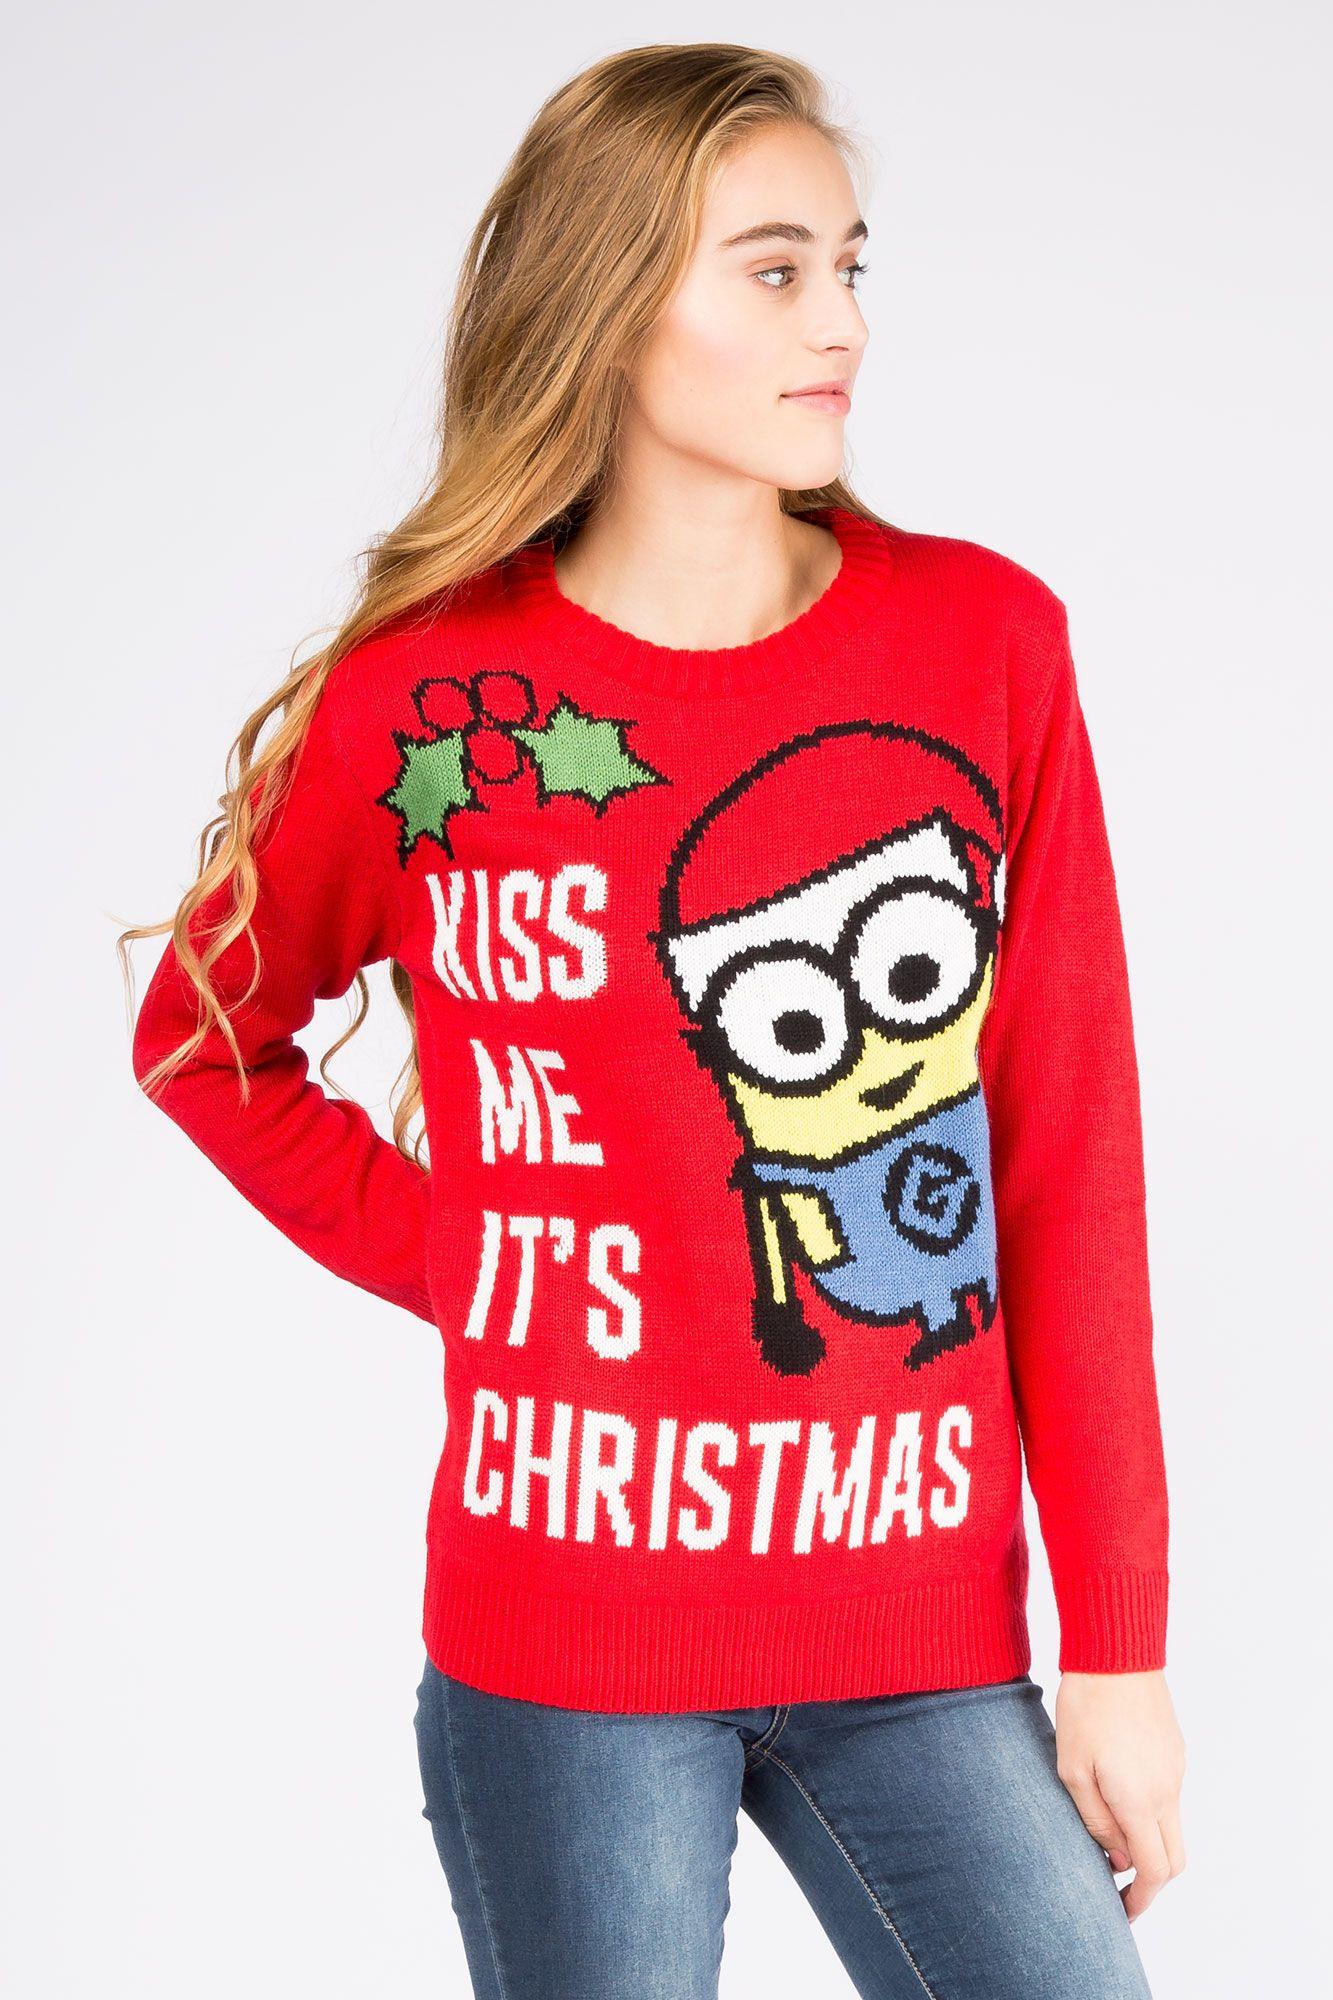 Girls Kiss Minion Christmas Sweater | Crazy Christmas | Pinterest ...